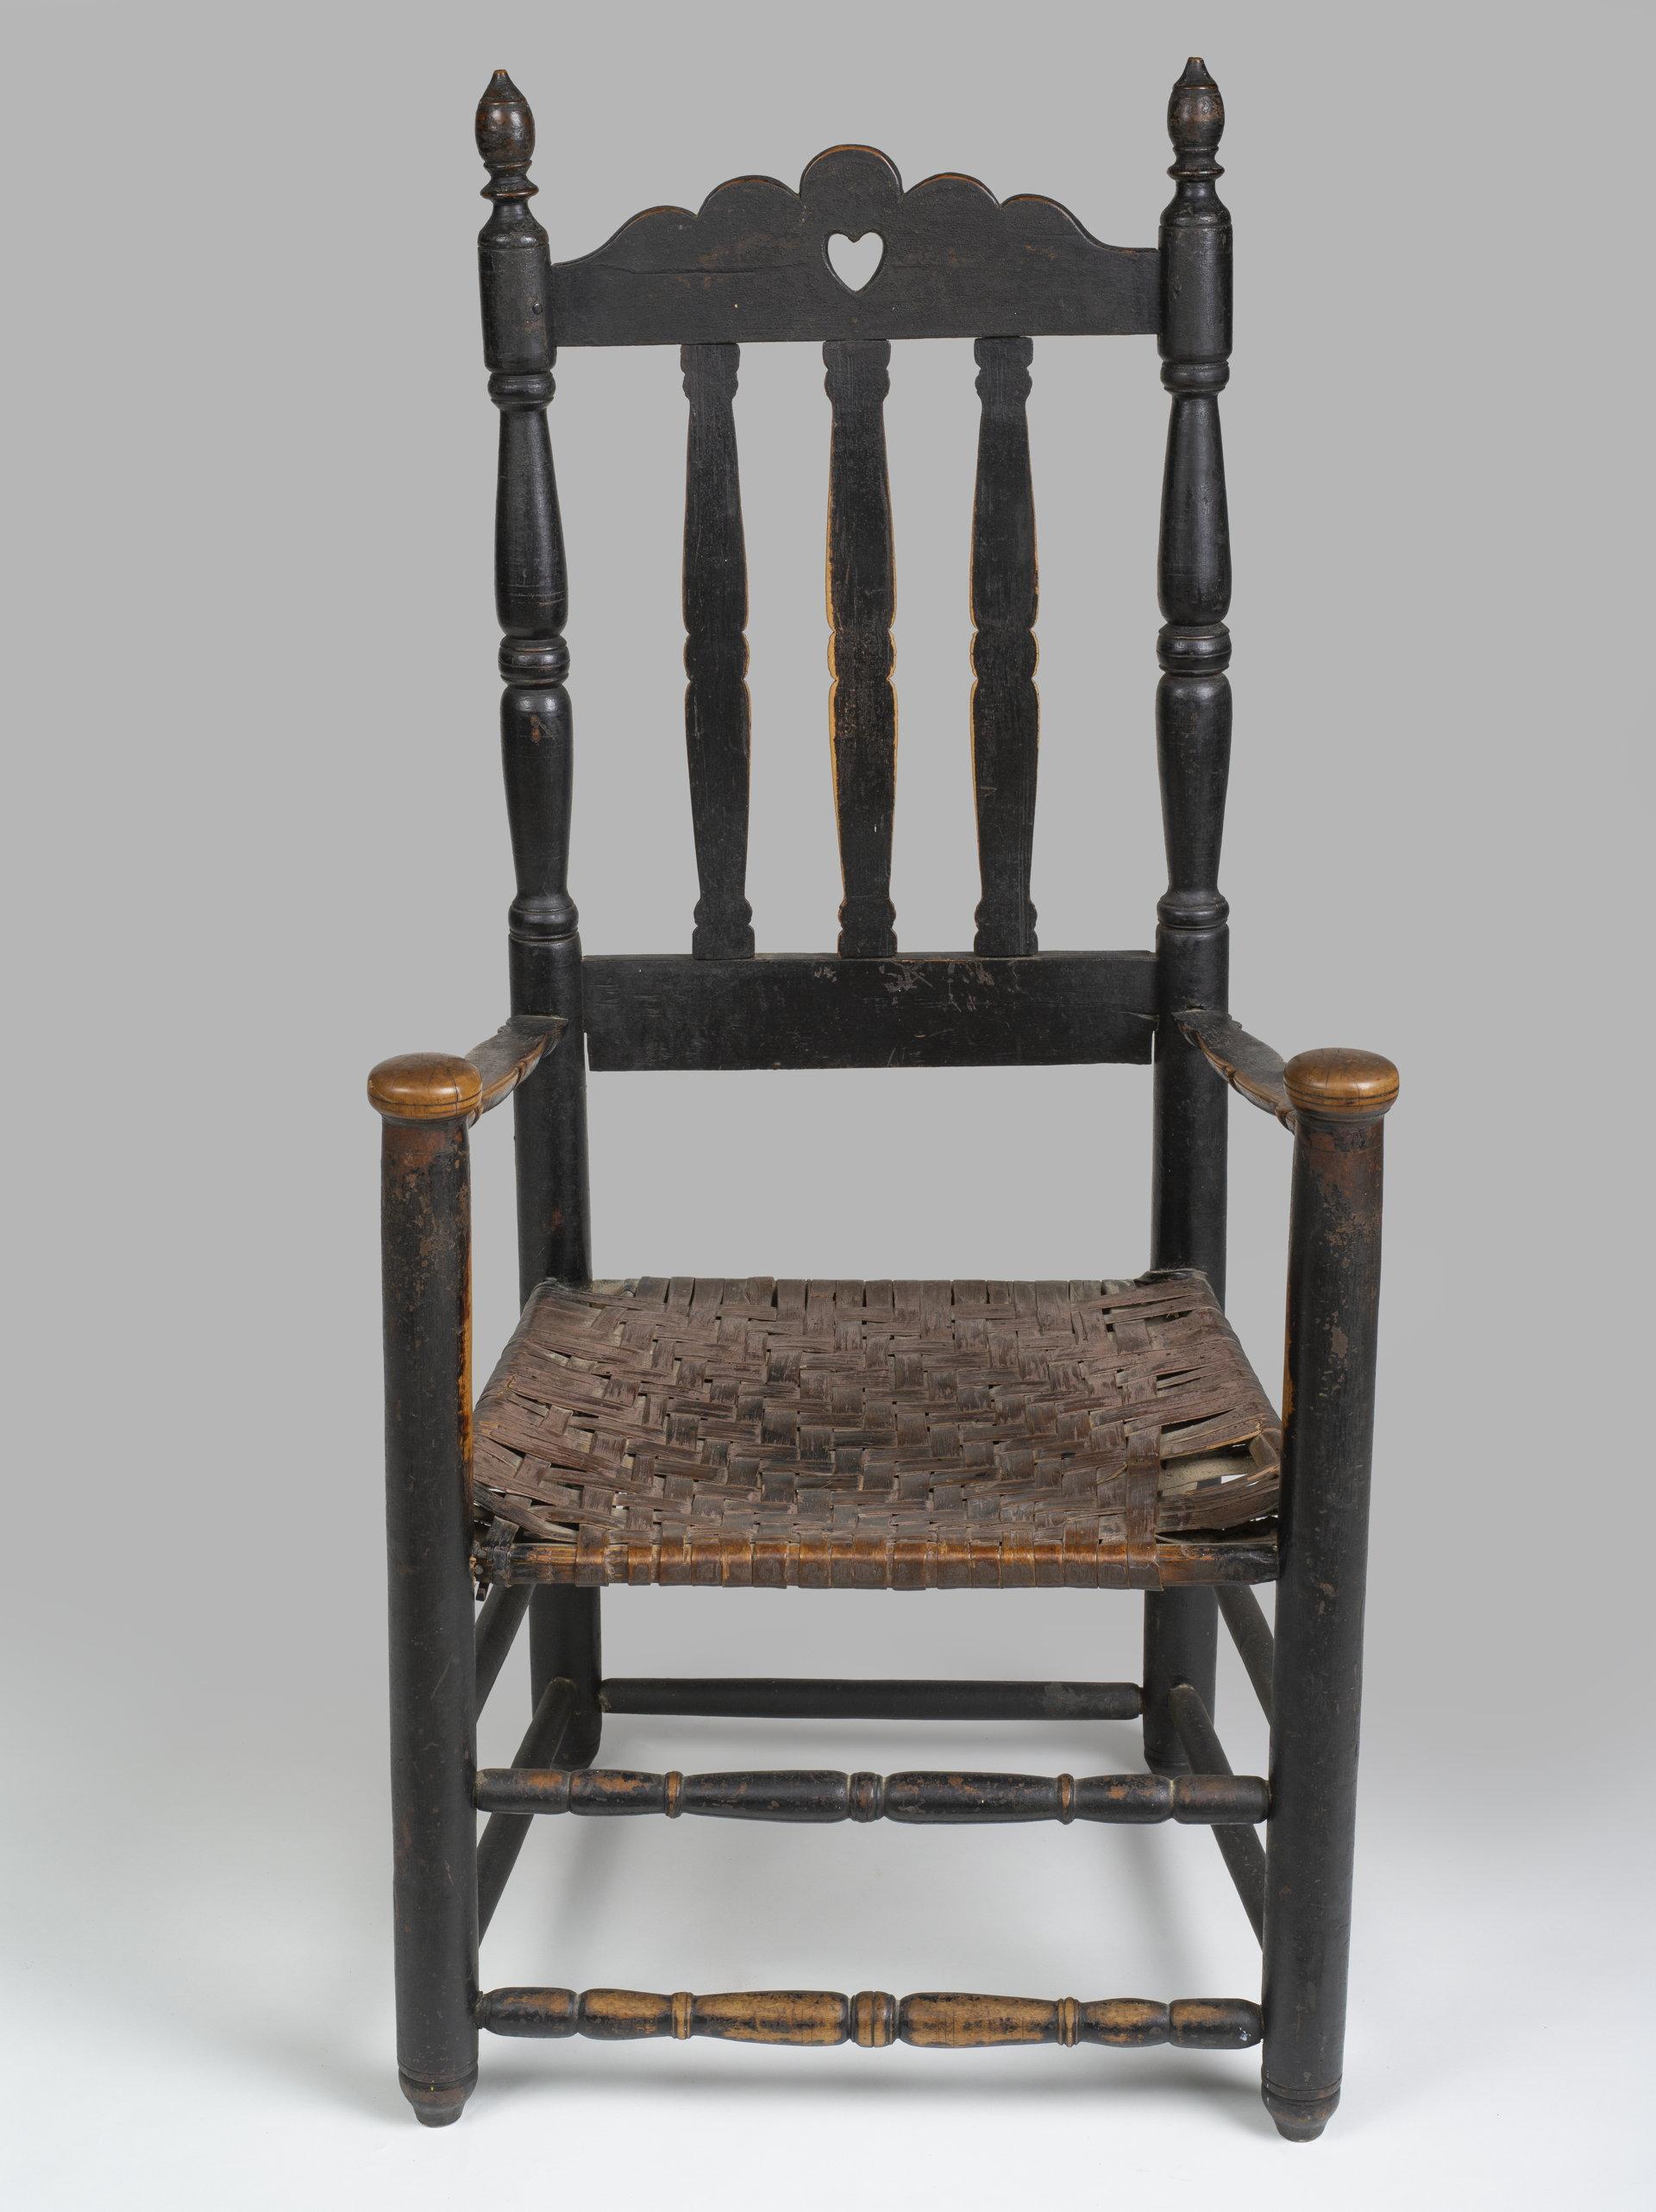 Surprising Peter H Eaton Antiques 8 Federal St Wiscasset Me 04578 Machost Co Dining Chair Design Ideas Machostcouk